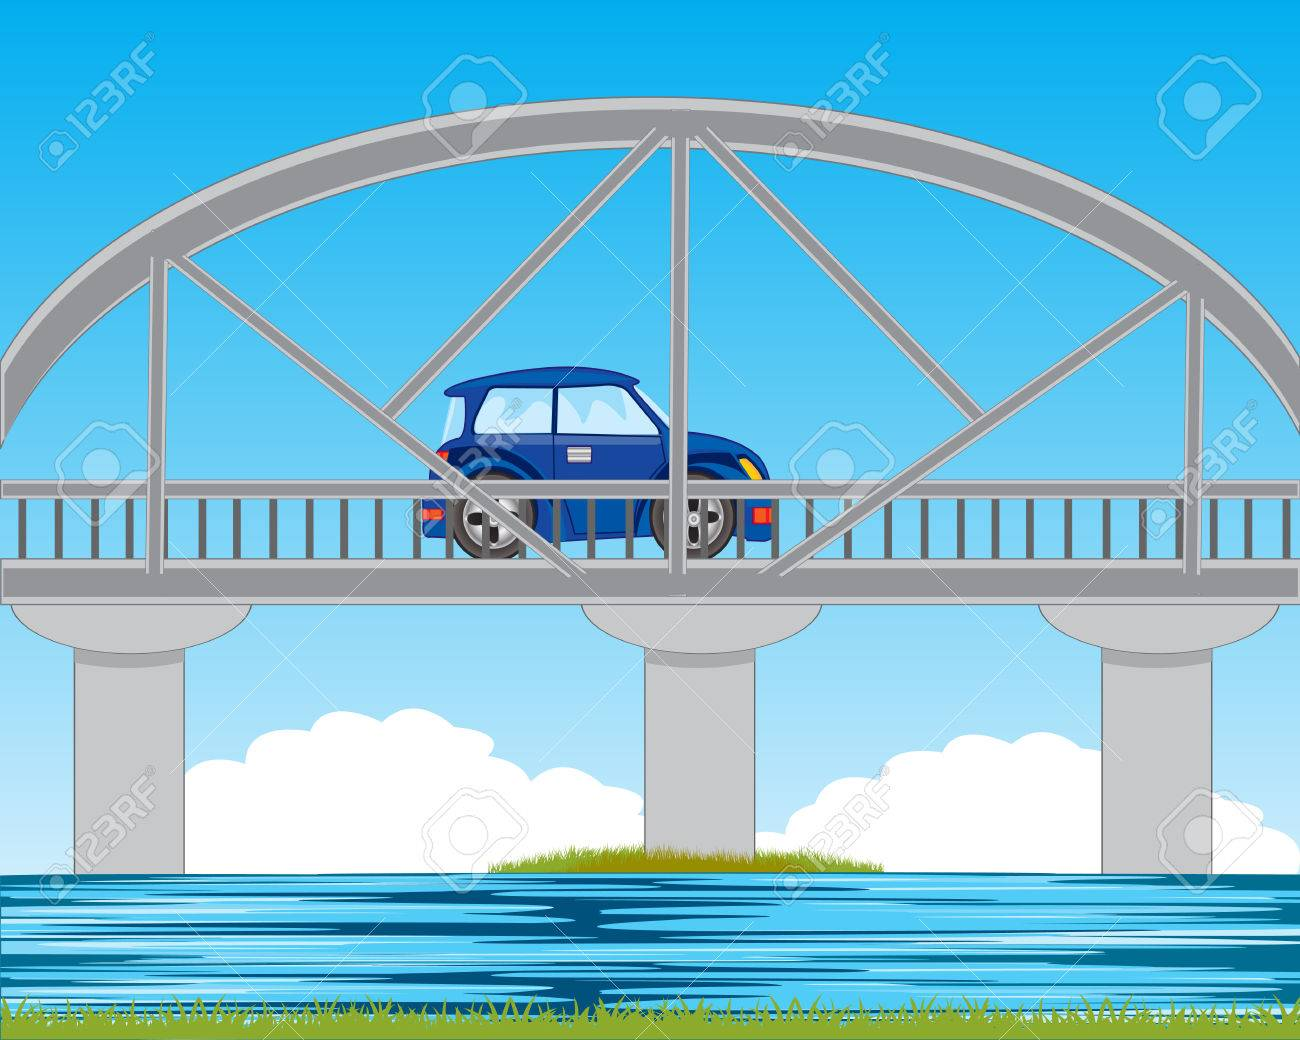 Bridge through river and blue car on him.